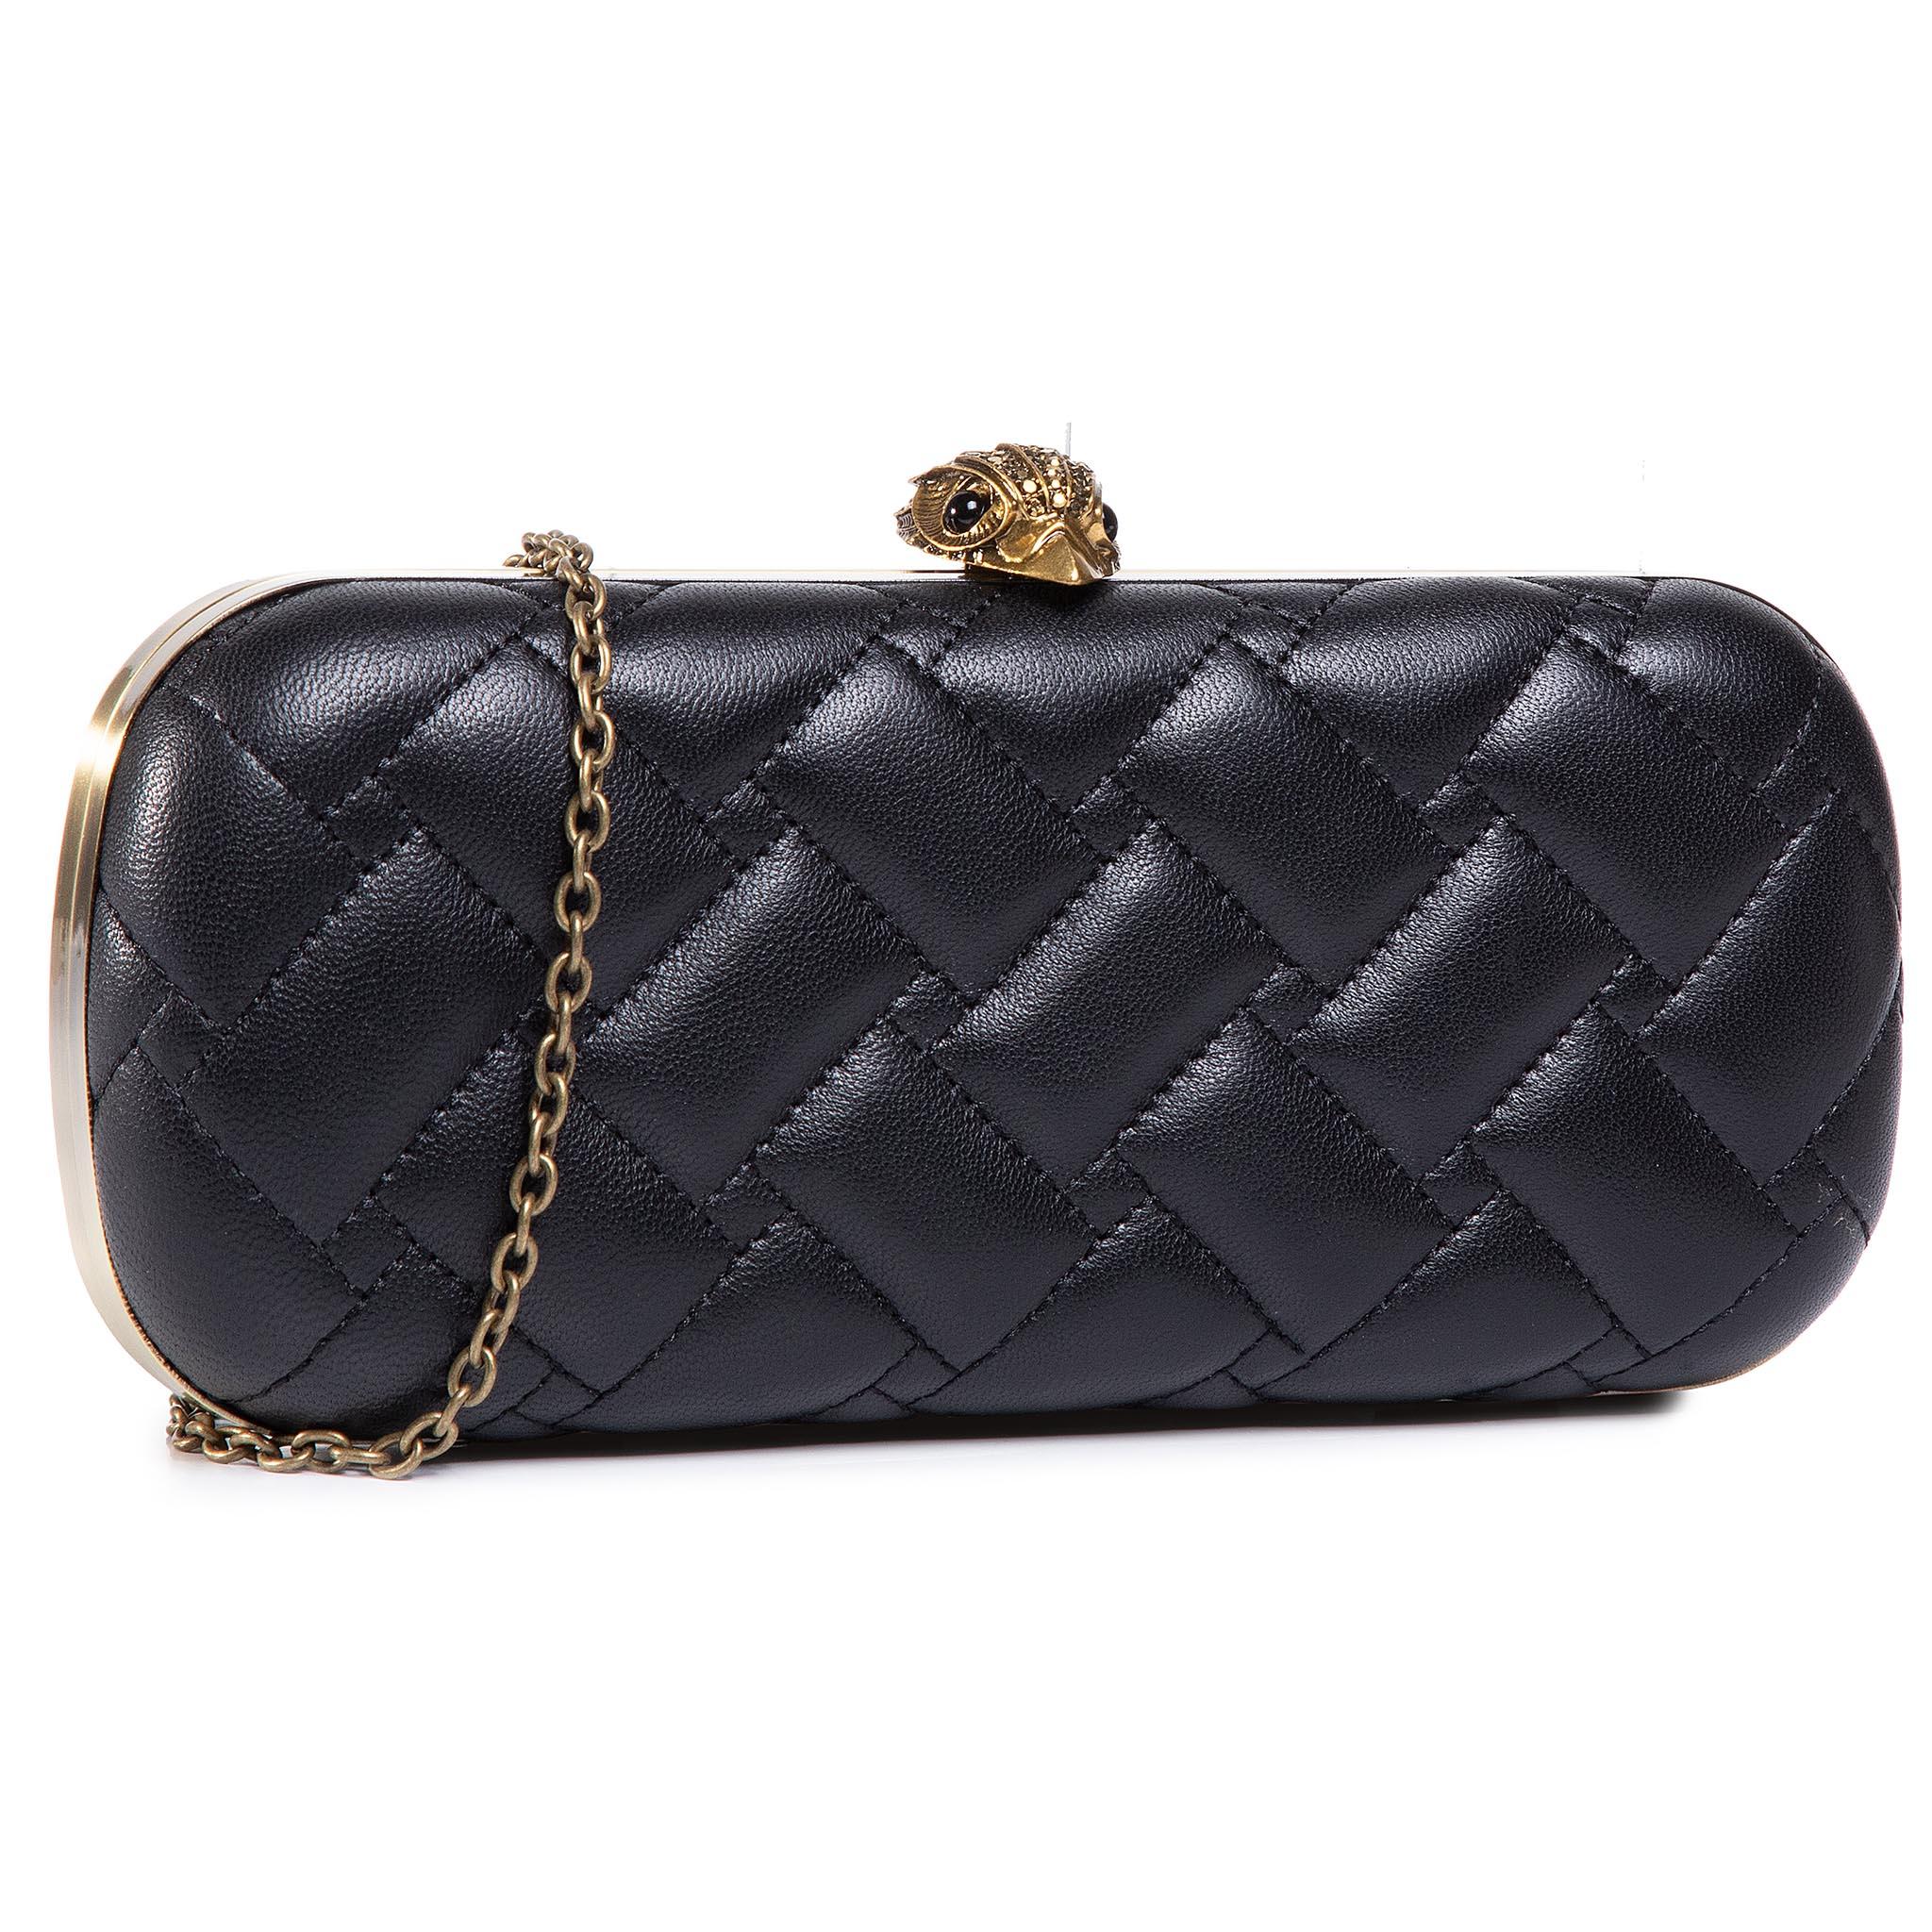 Image of Handtasche KURT GEIGER - Kensington Oval Cluth 5372500109 Black